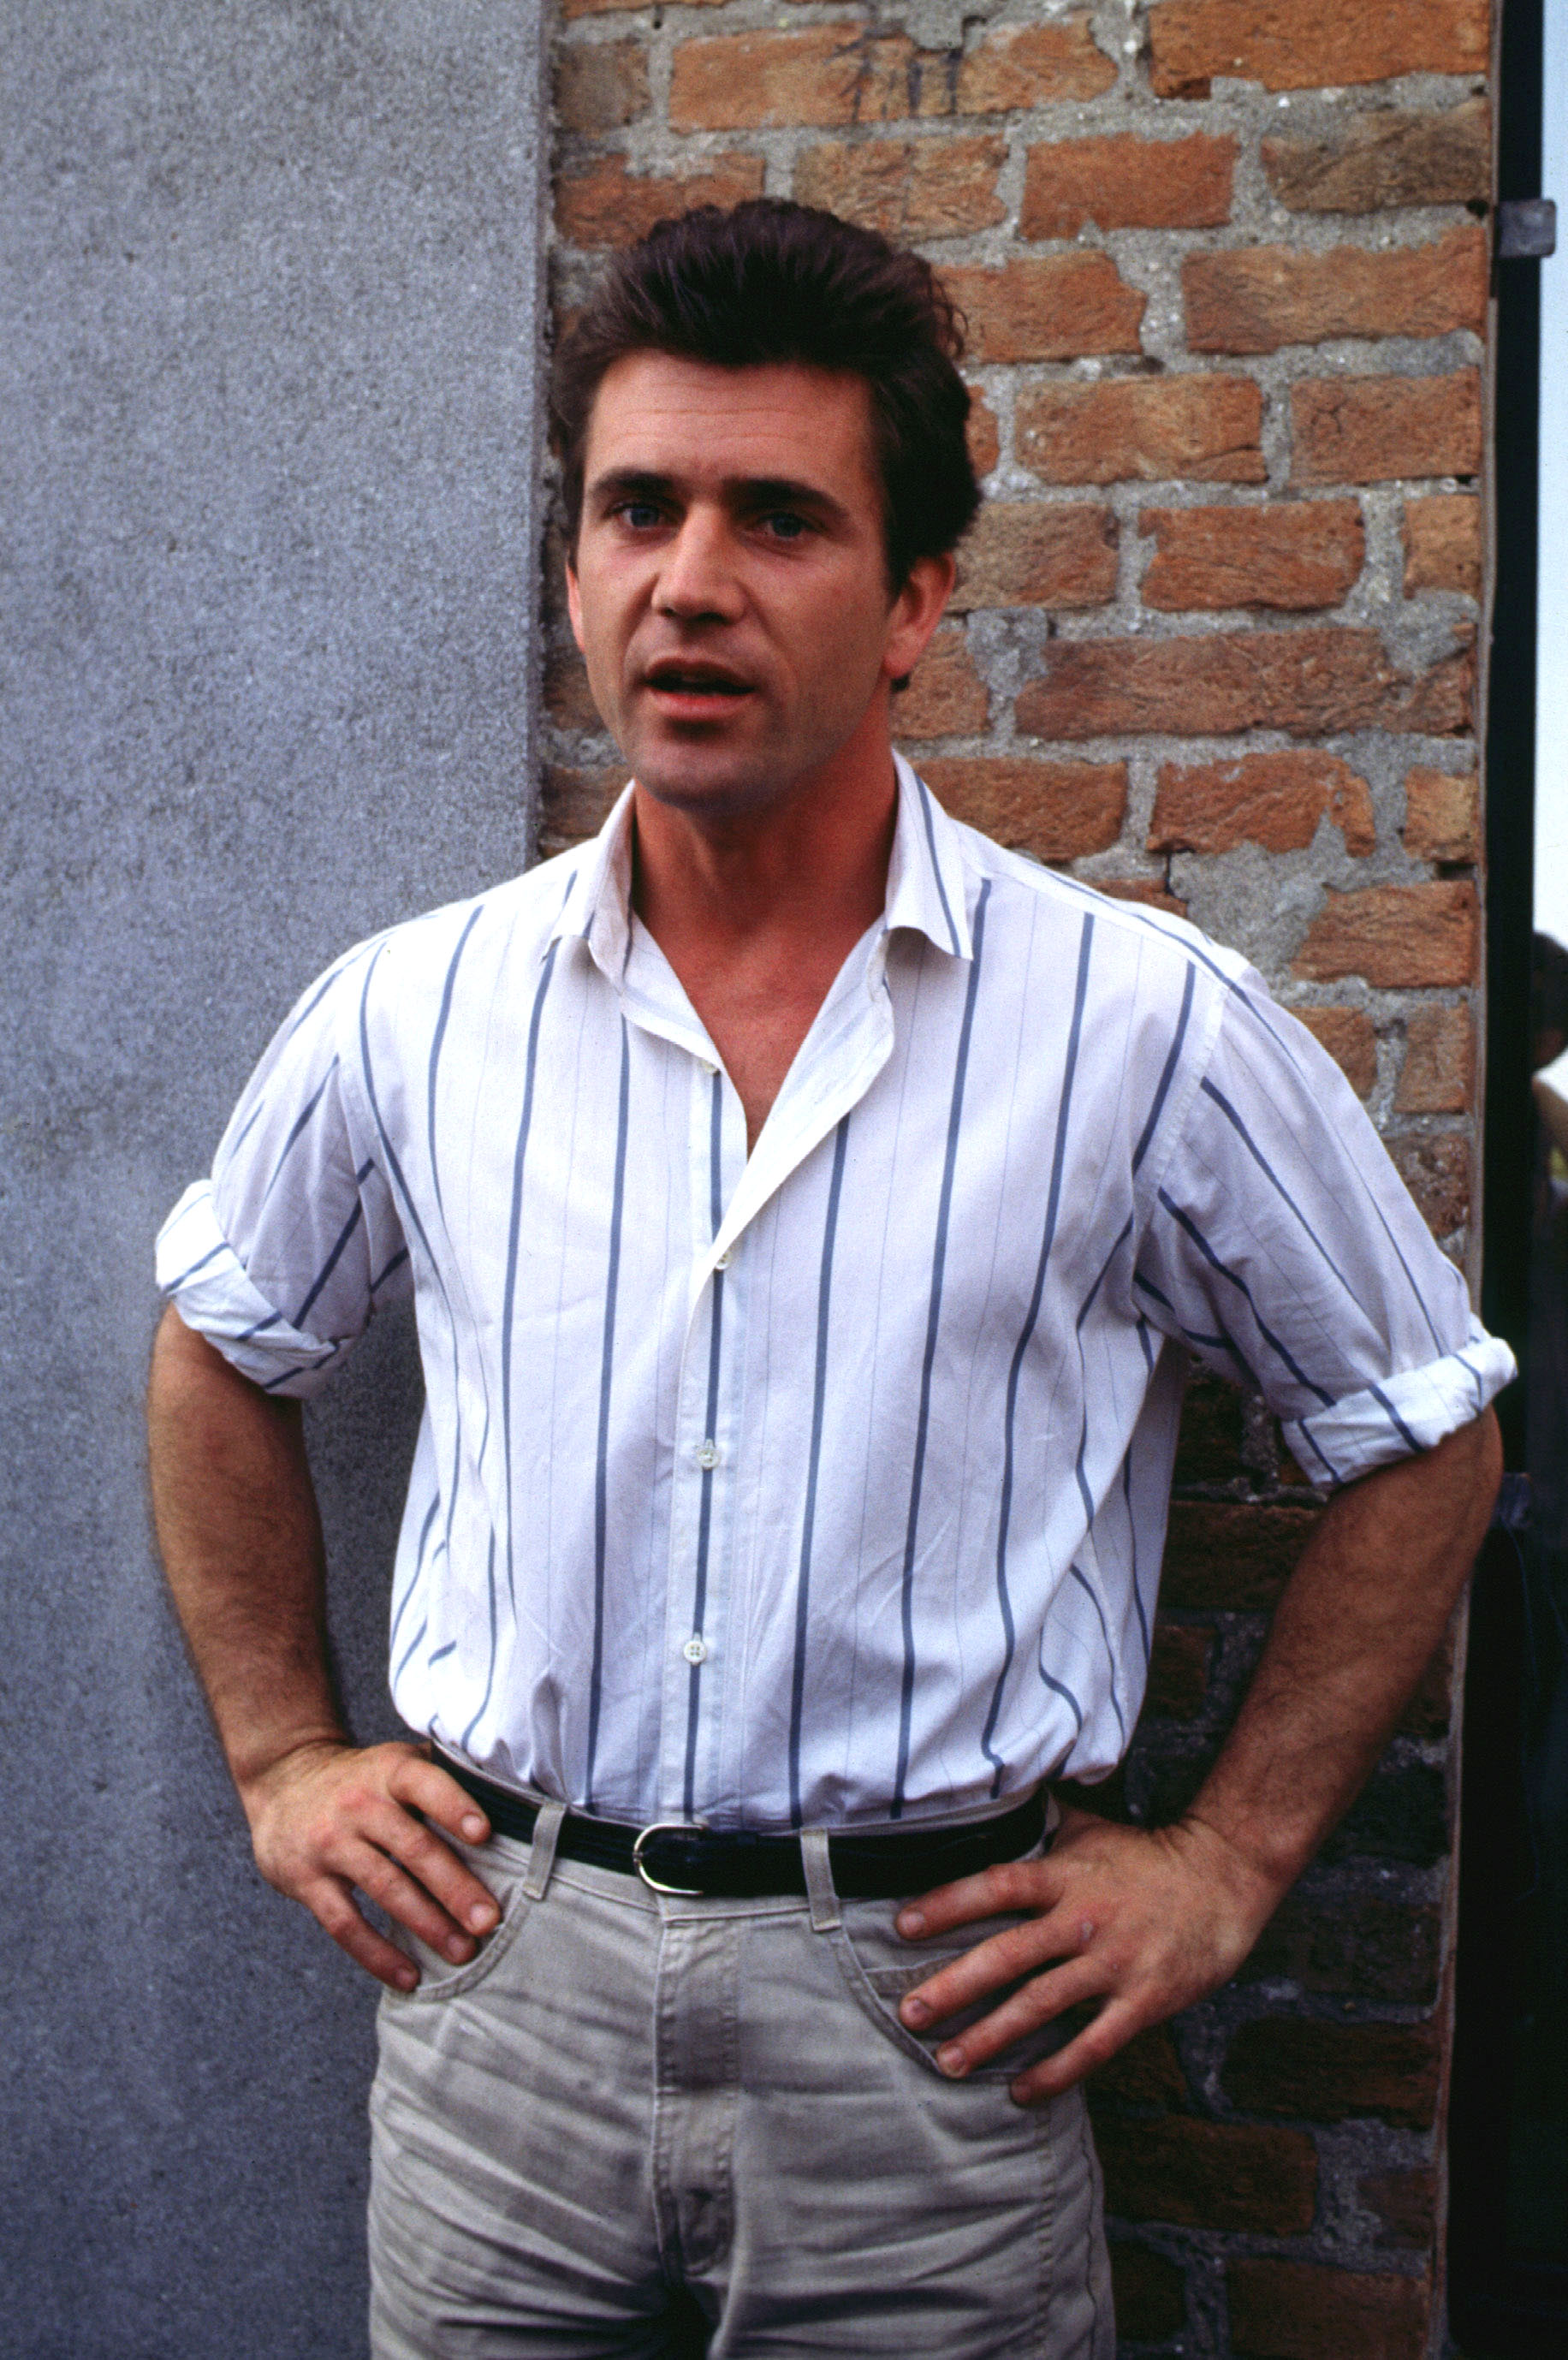 File:Mel Gibson, 1985 03.jpg - Wikimedia Commons